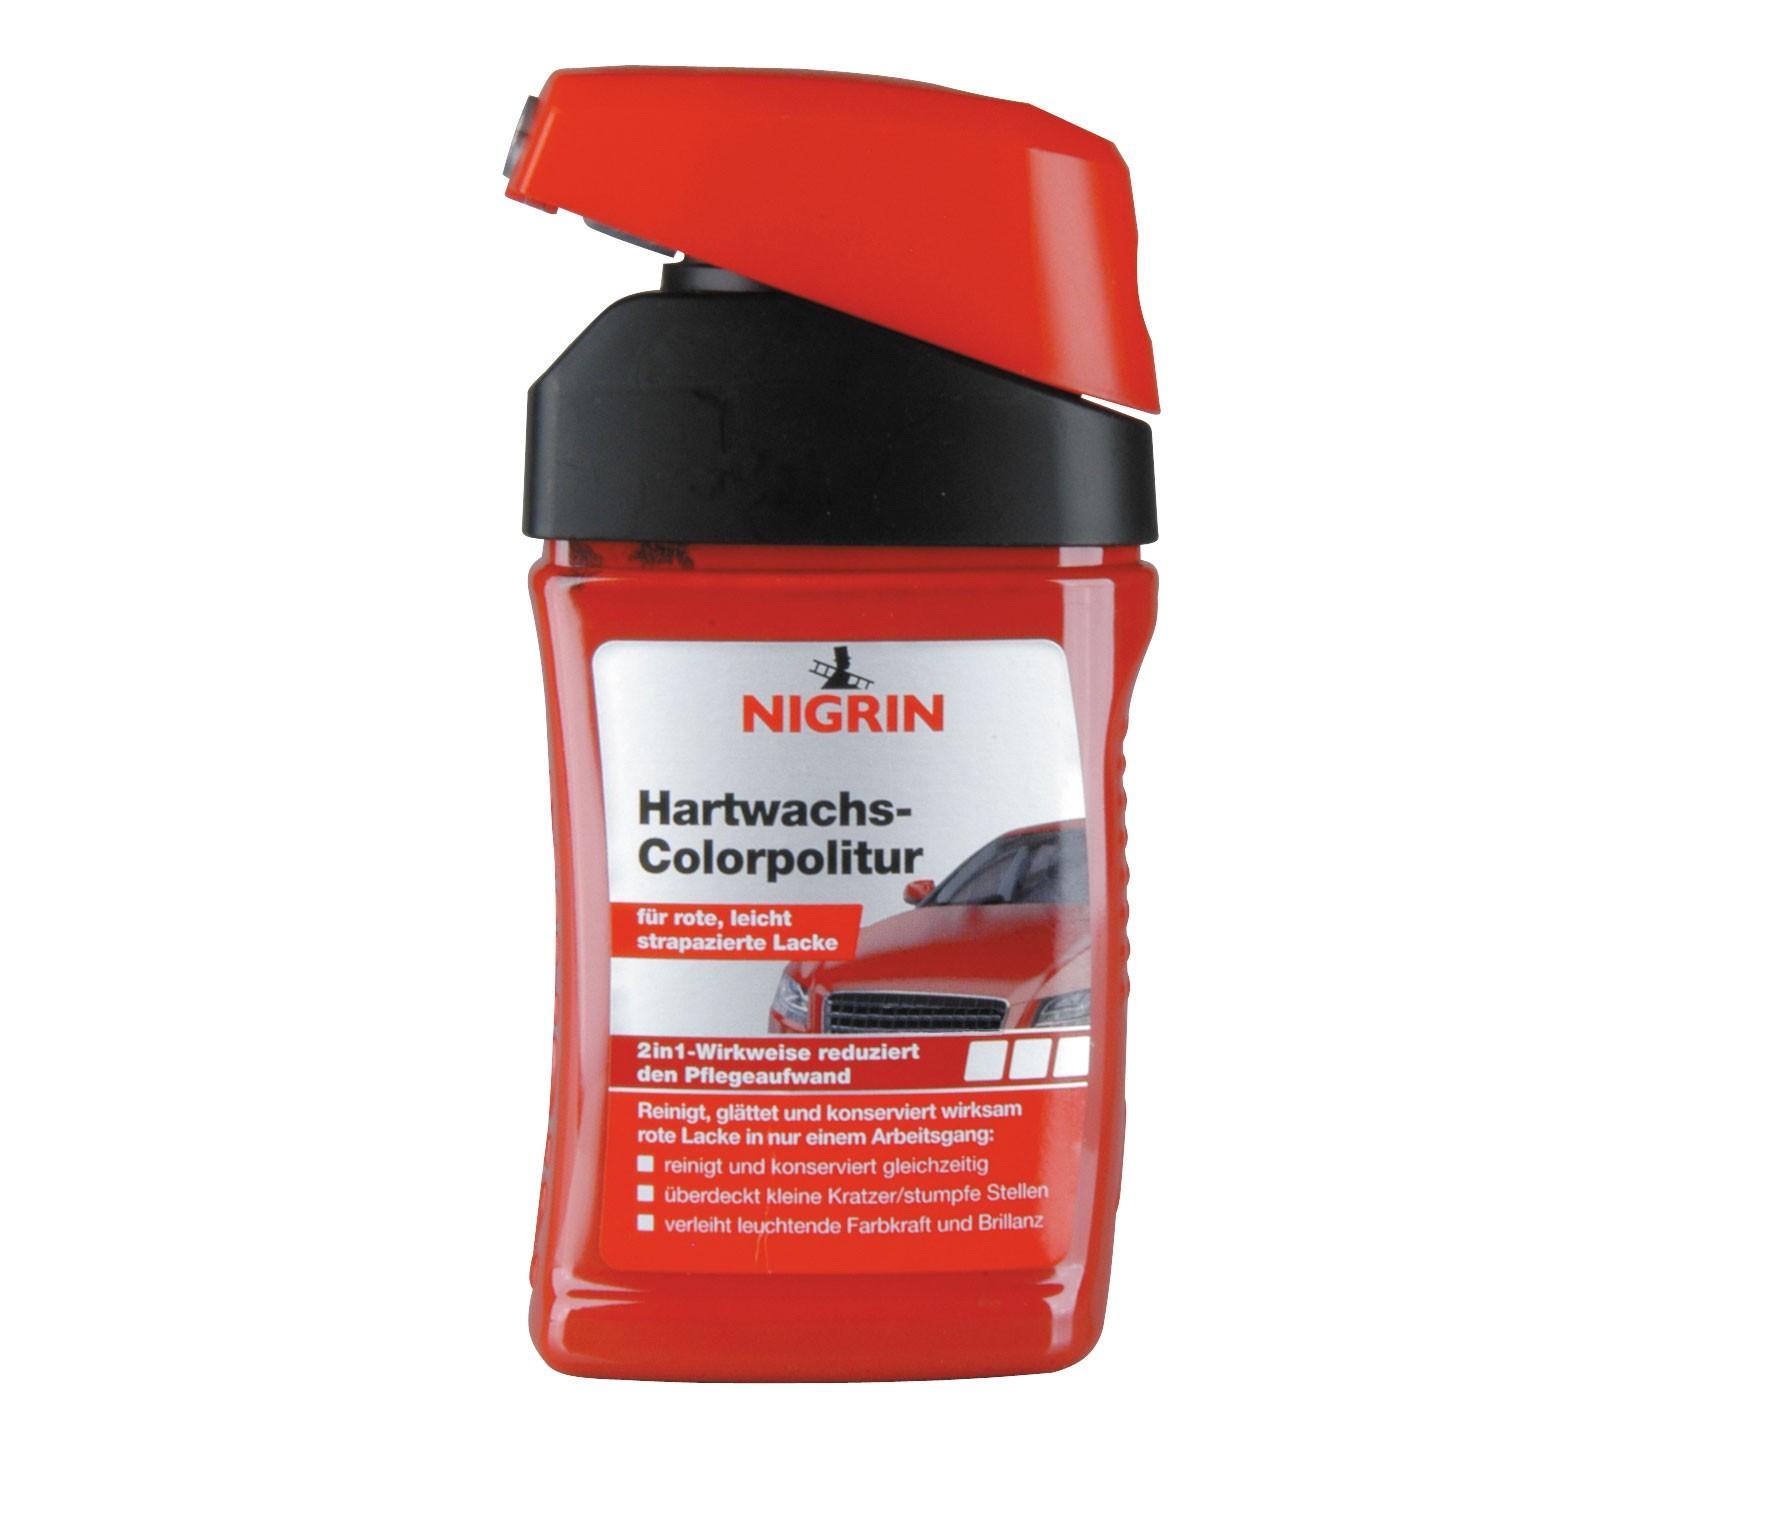 Nigrin Lackpflege Hartwachs-Colorpolitur rot 300ml Bild 1